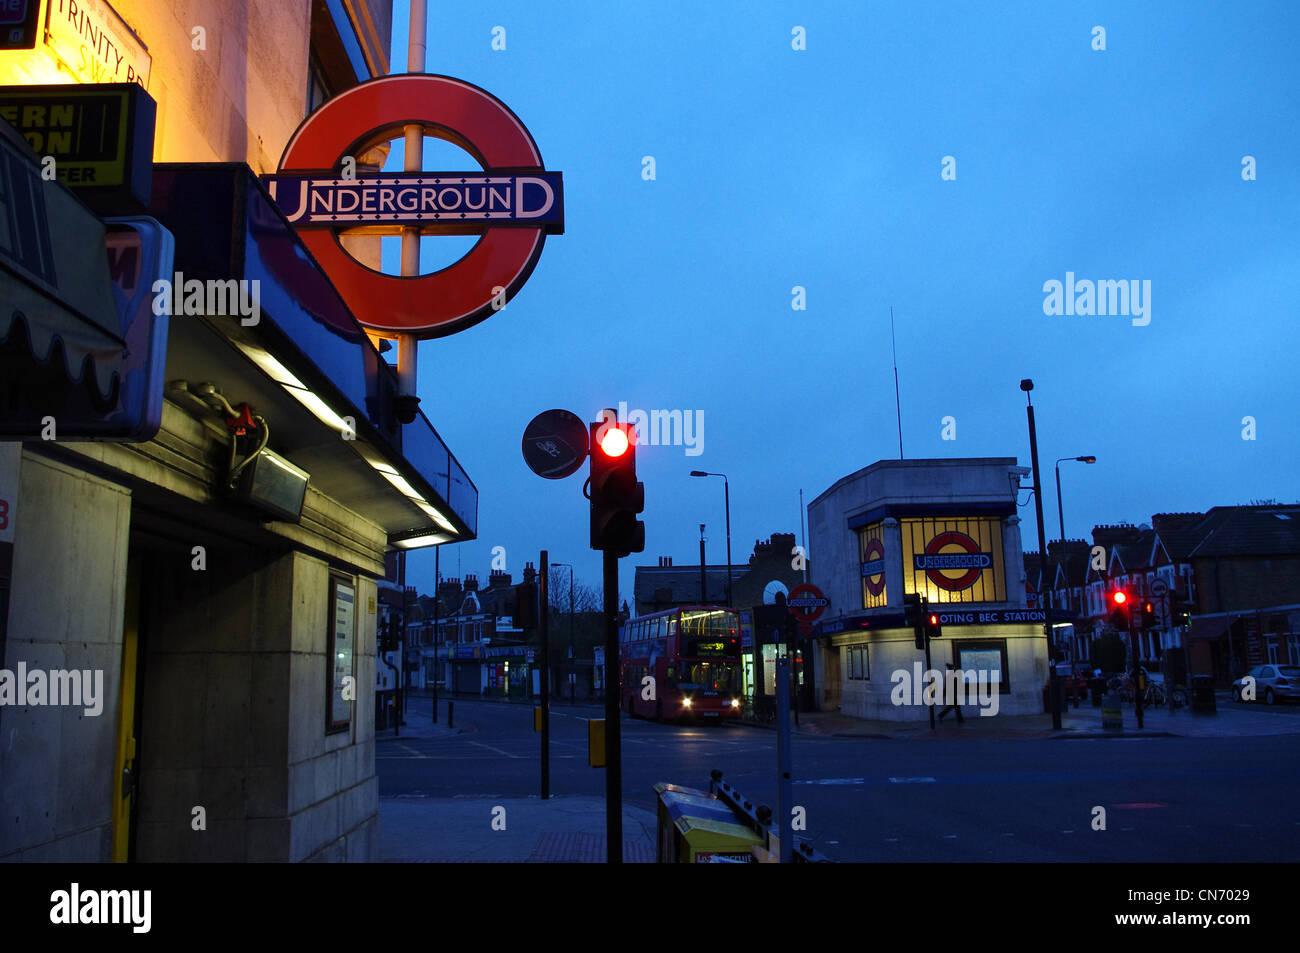 Tooting Bec Underground Station, London - Stock Image